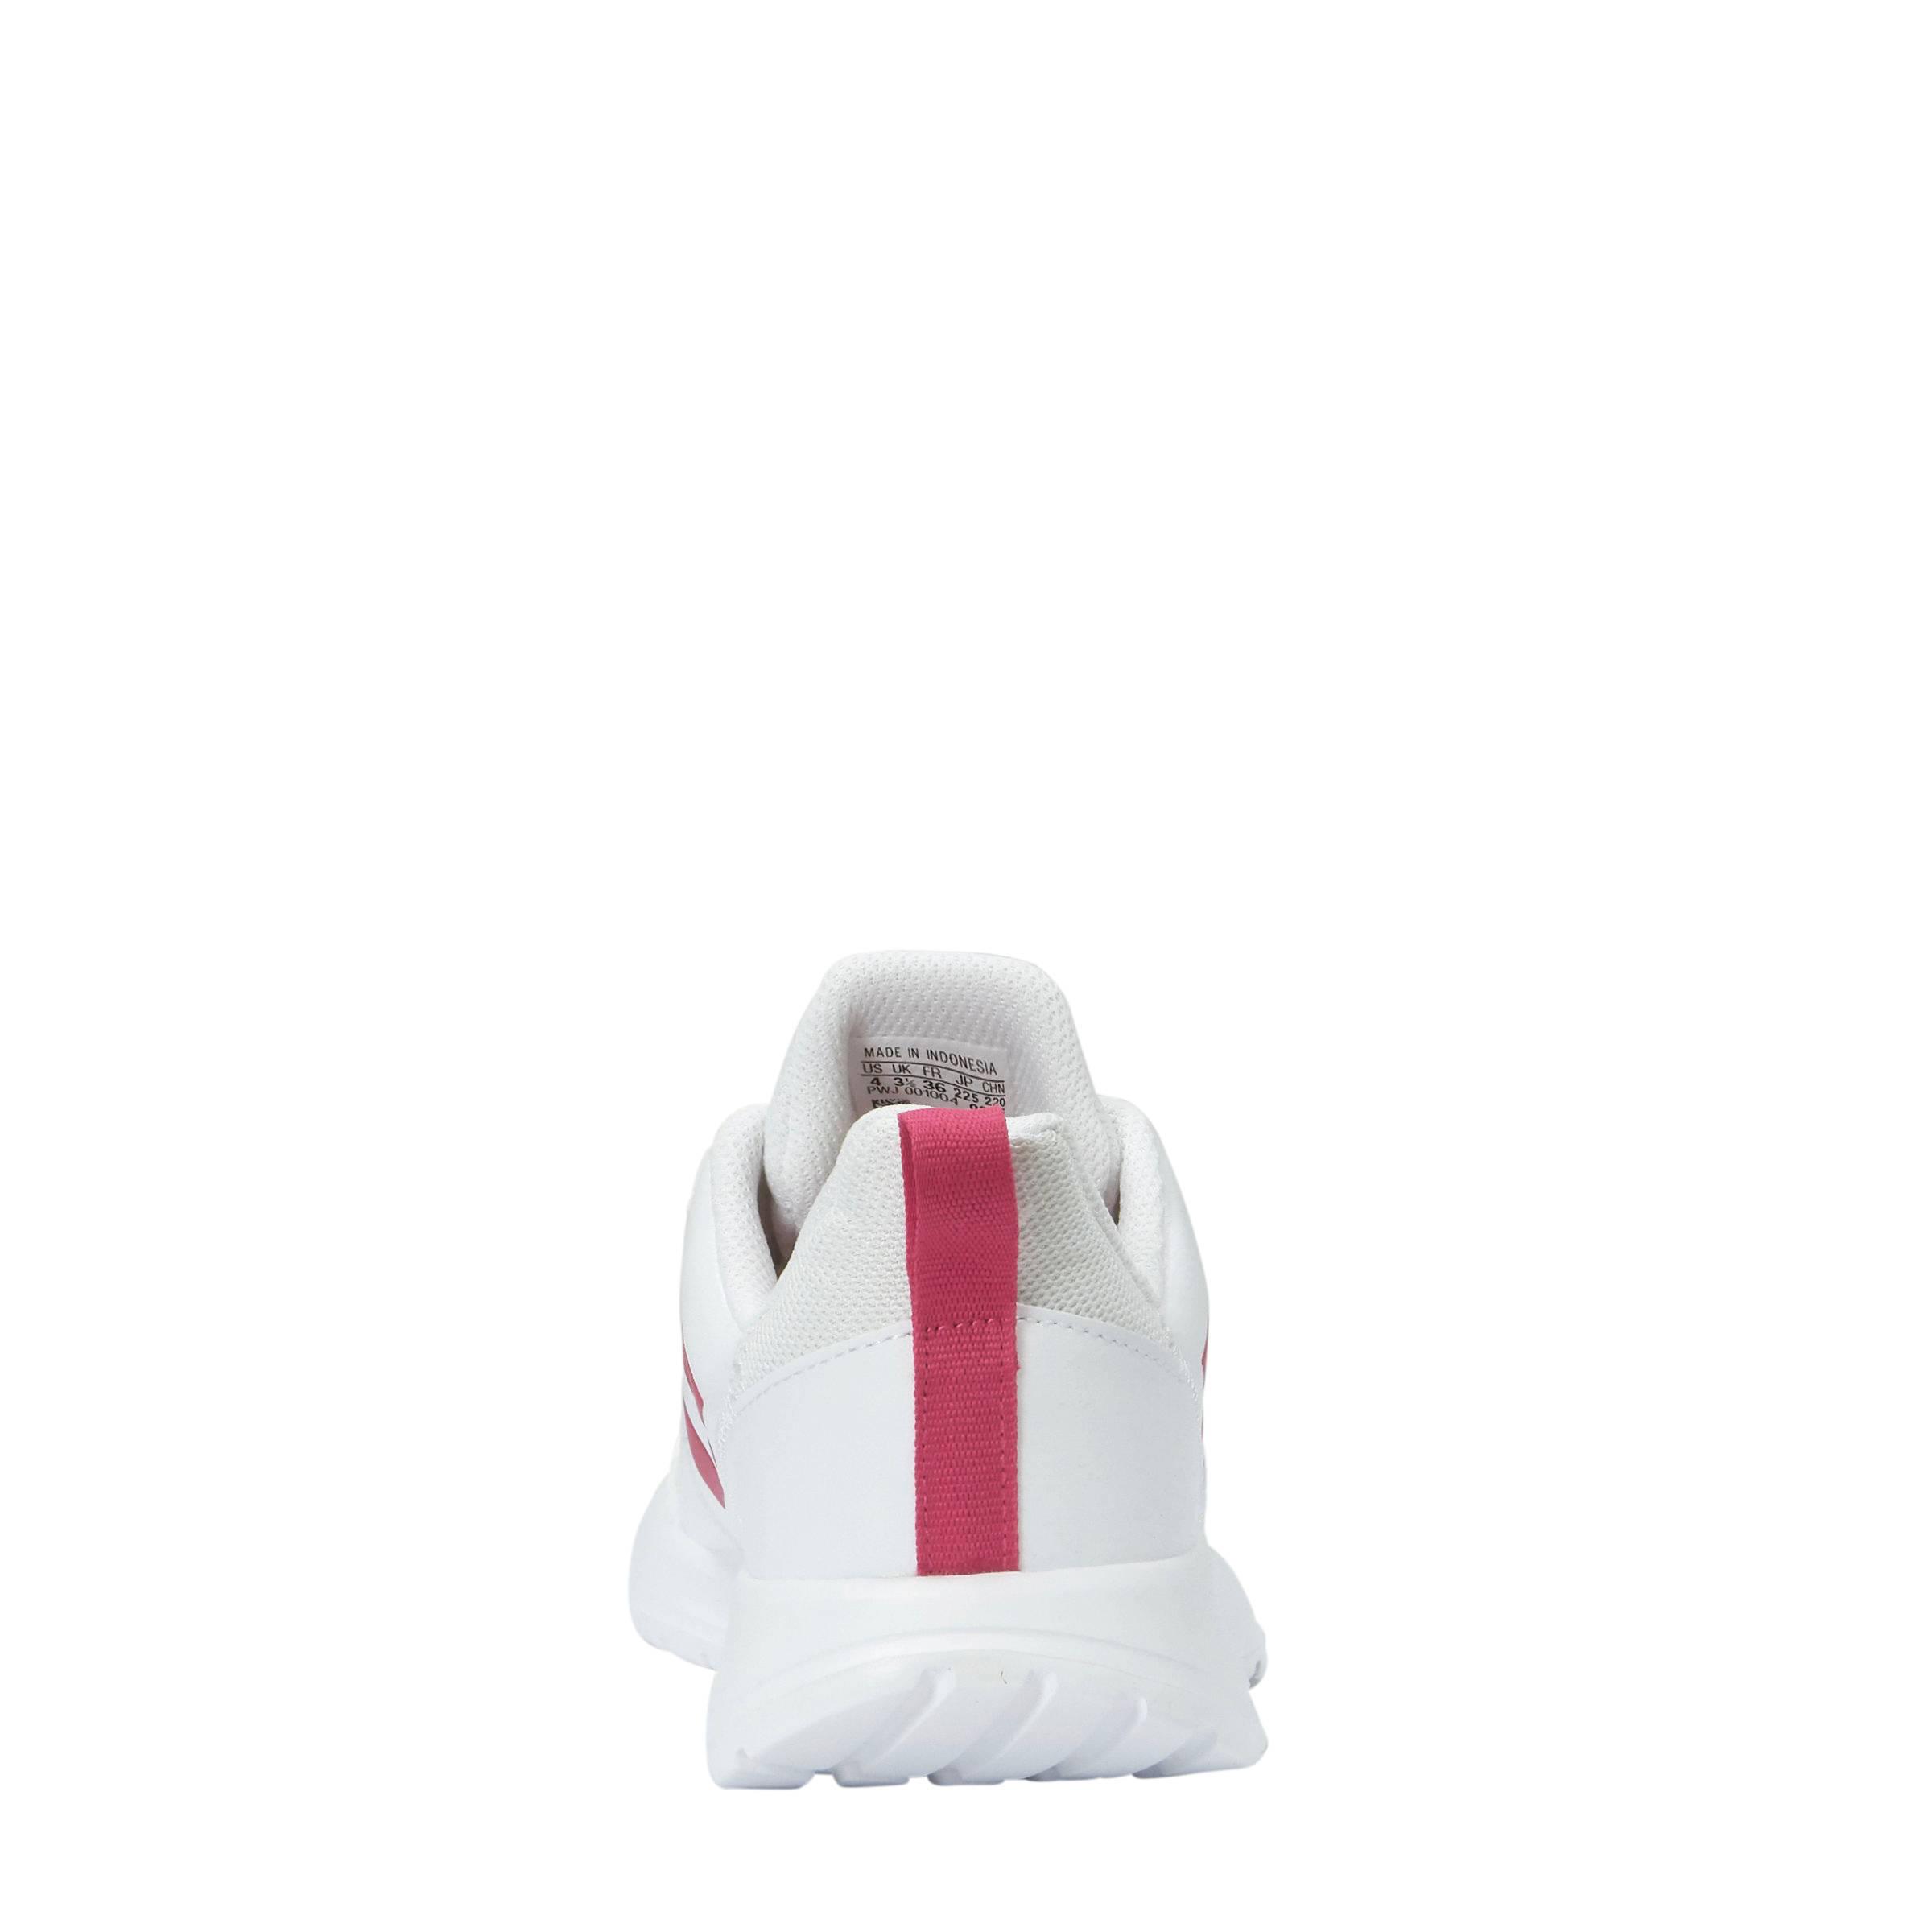 new style f9ff0 1389a adidas performance AltaRun K sportschoenen witroze  wehkamp